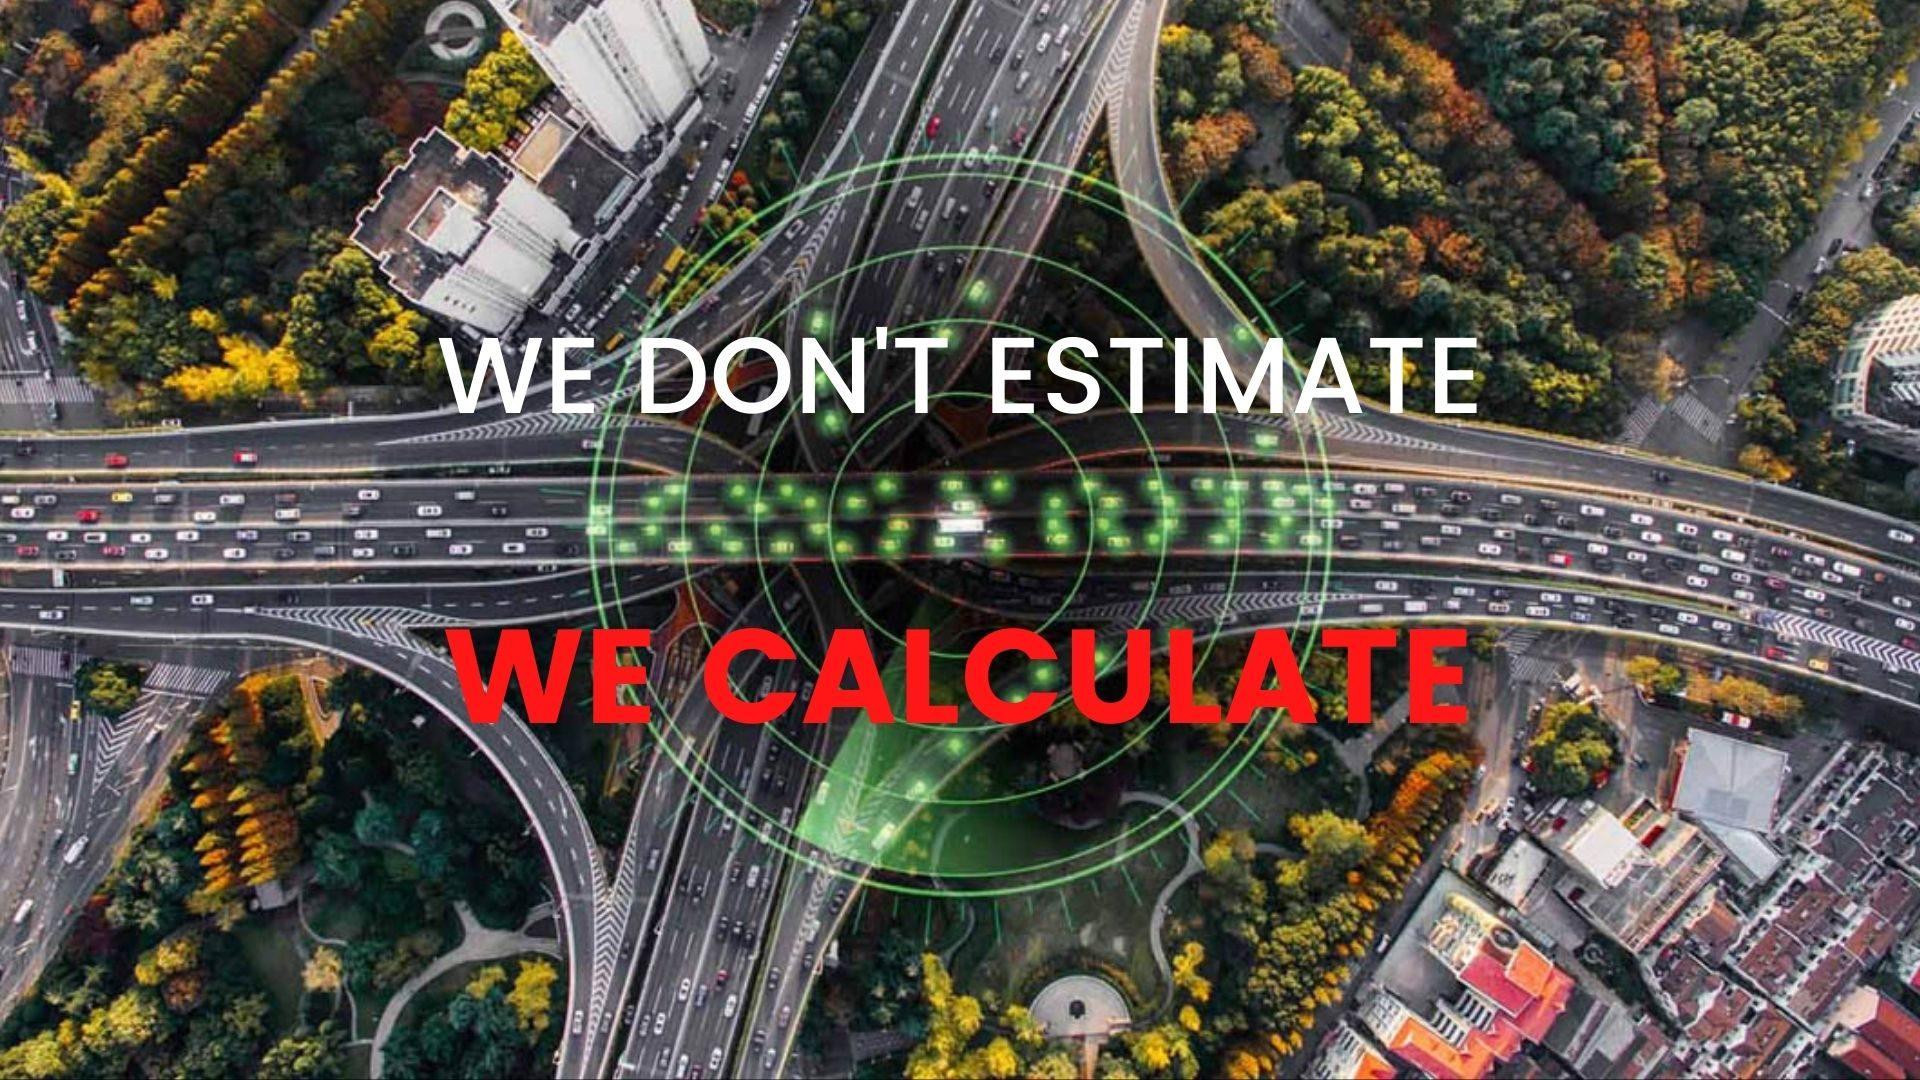 We don't estimate, we calculate